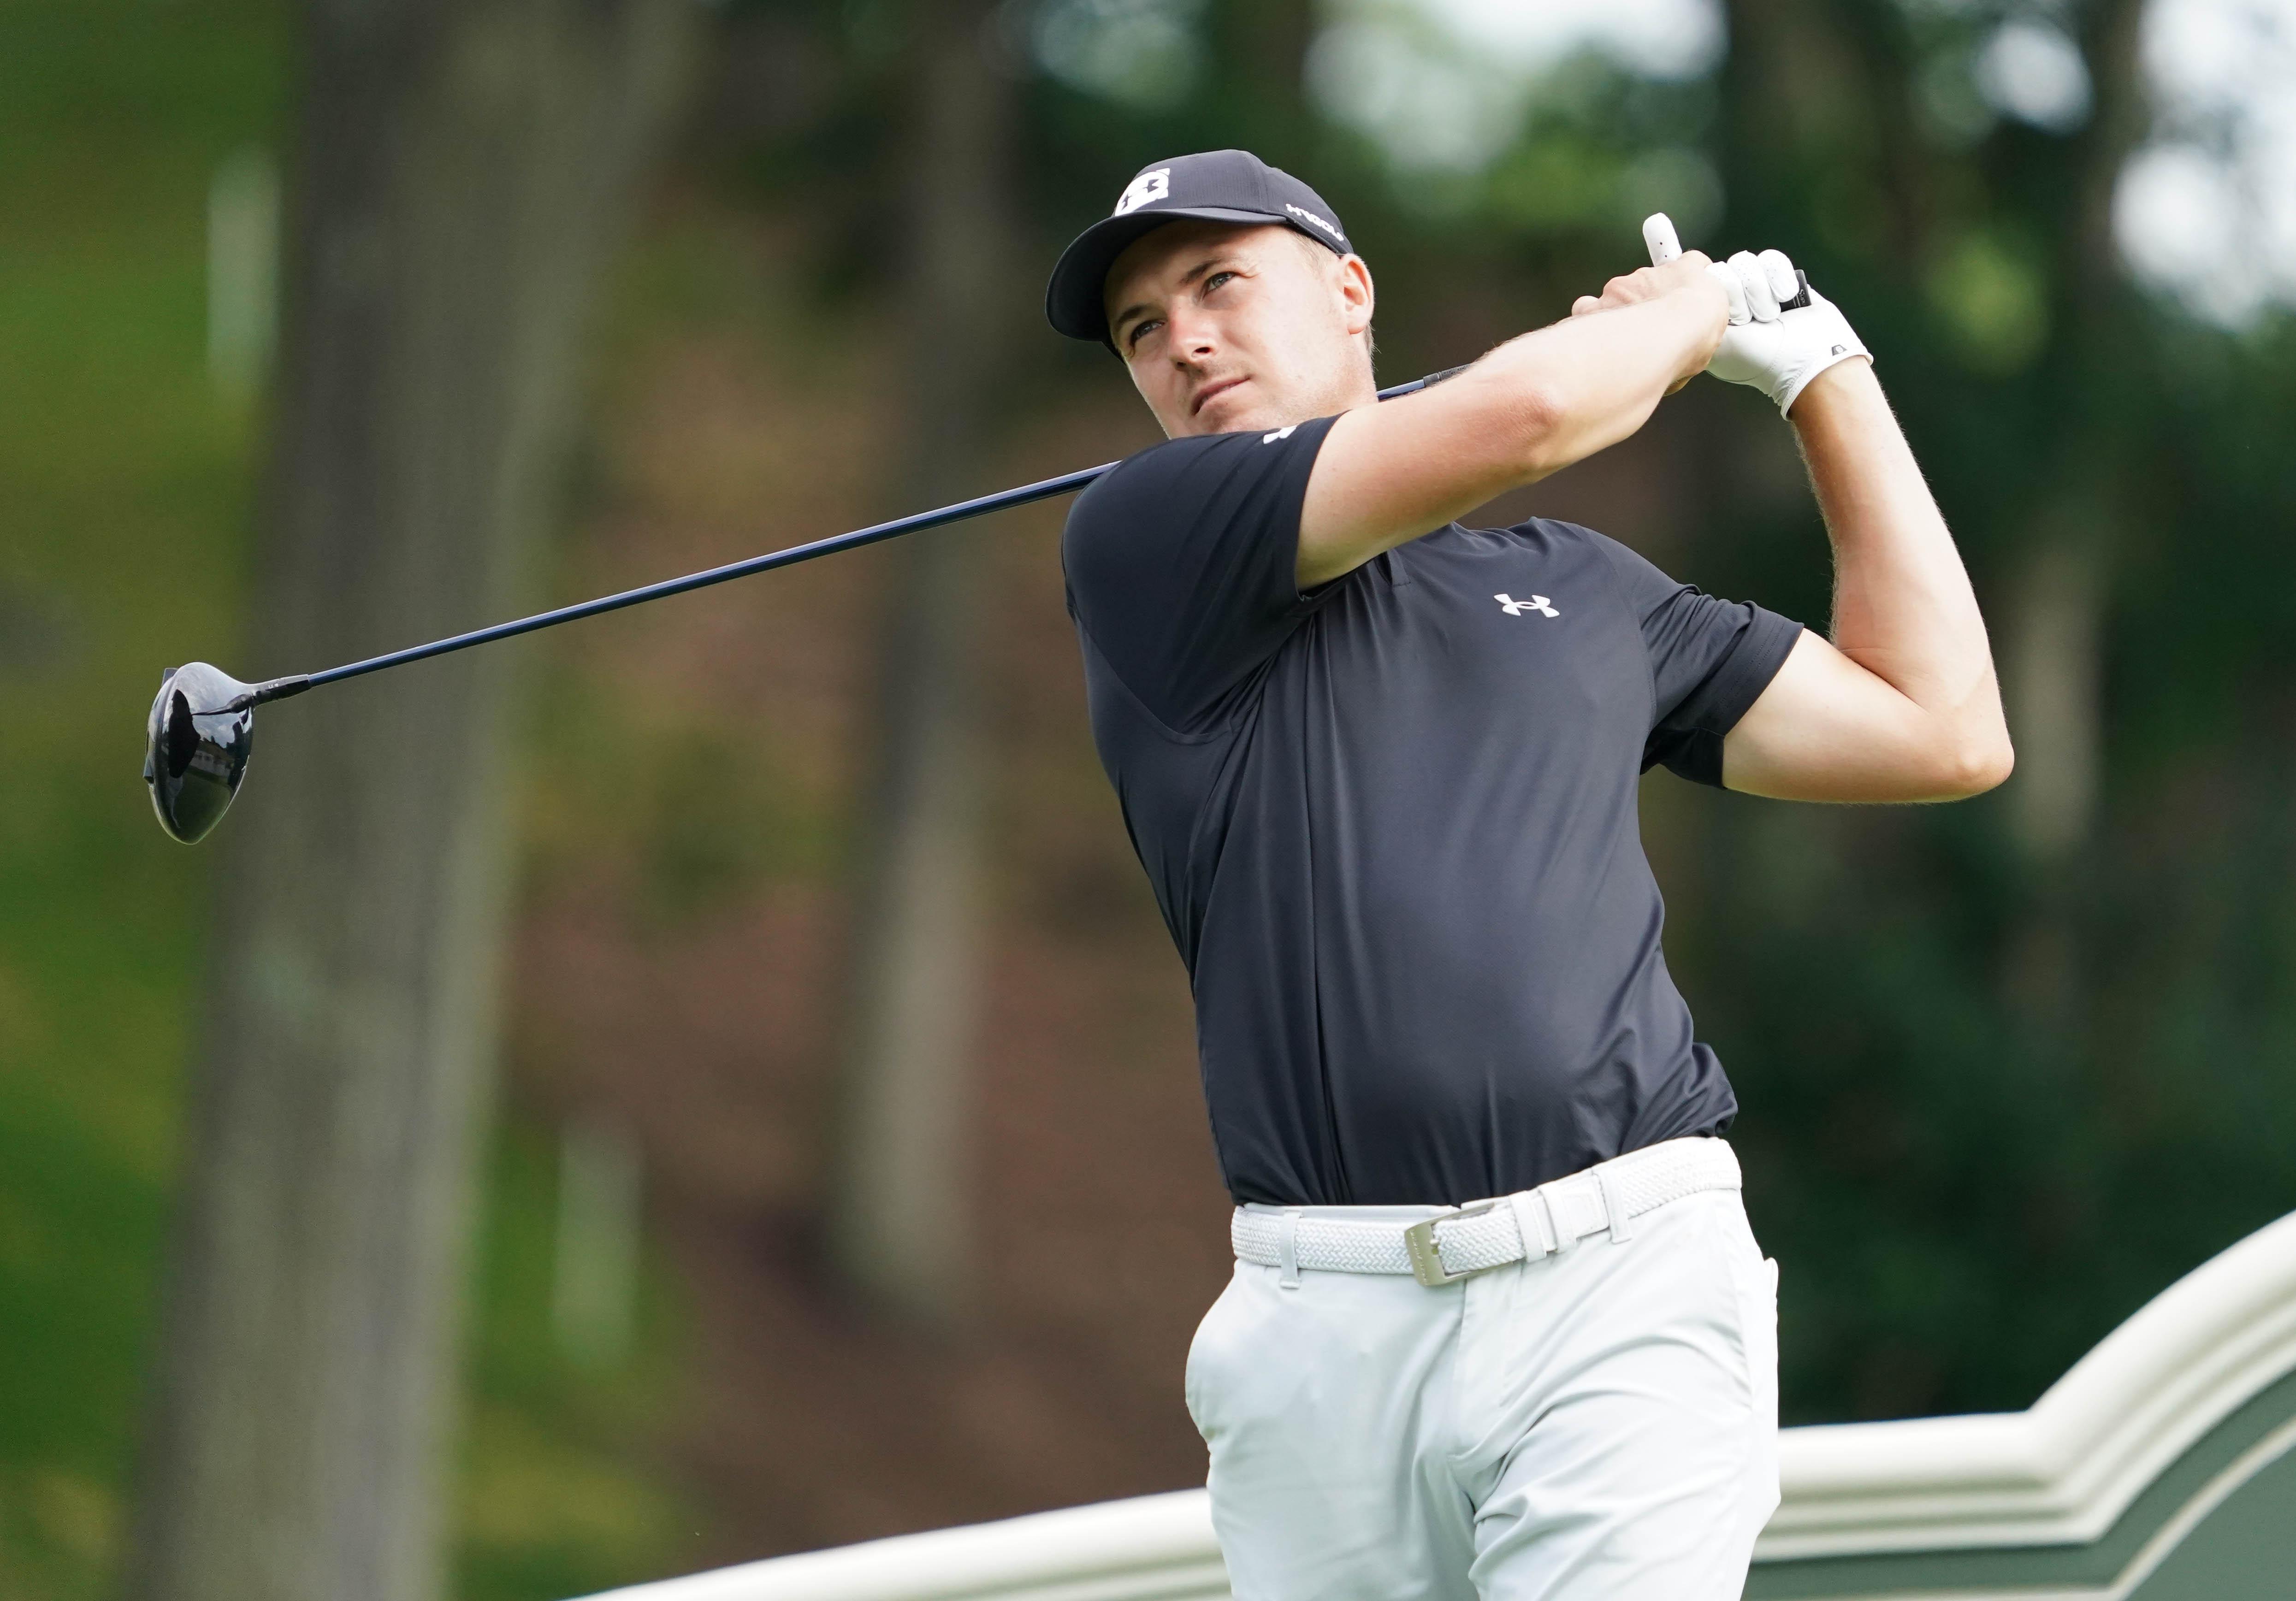 PGA: Travelers Championship - First Round